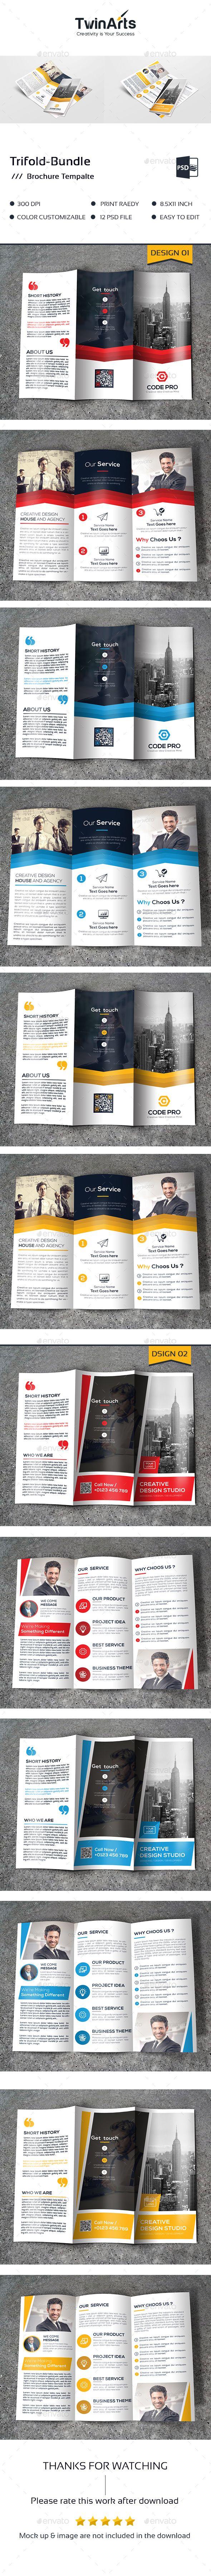 25 best premium brochure templates images on pinterest brochures